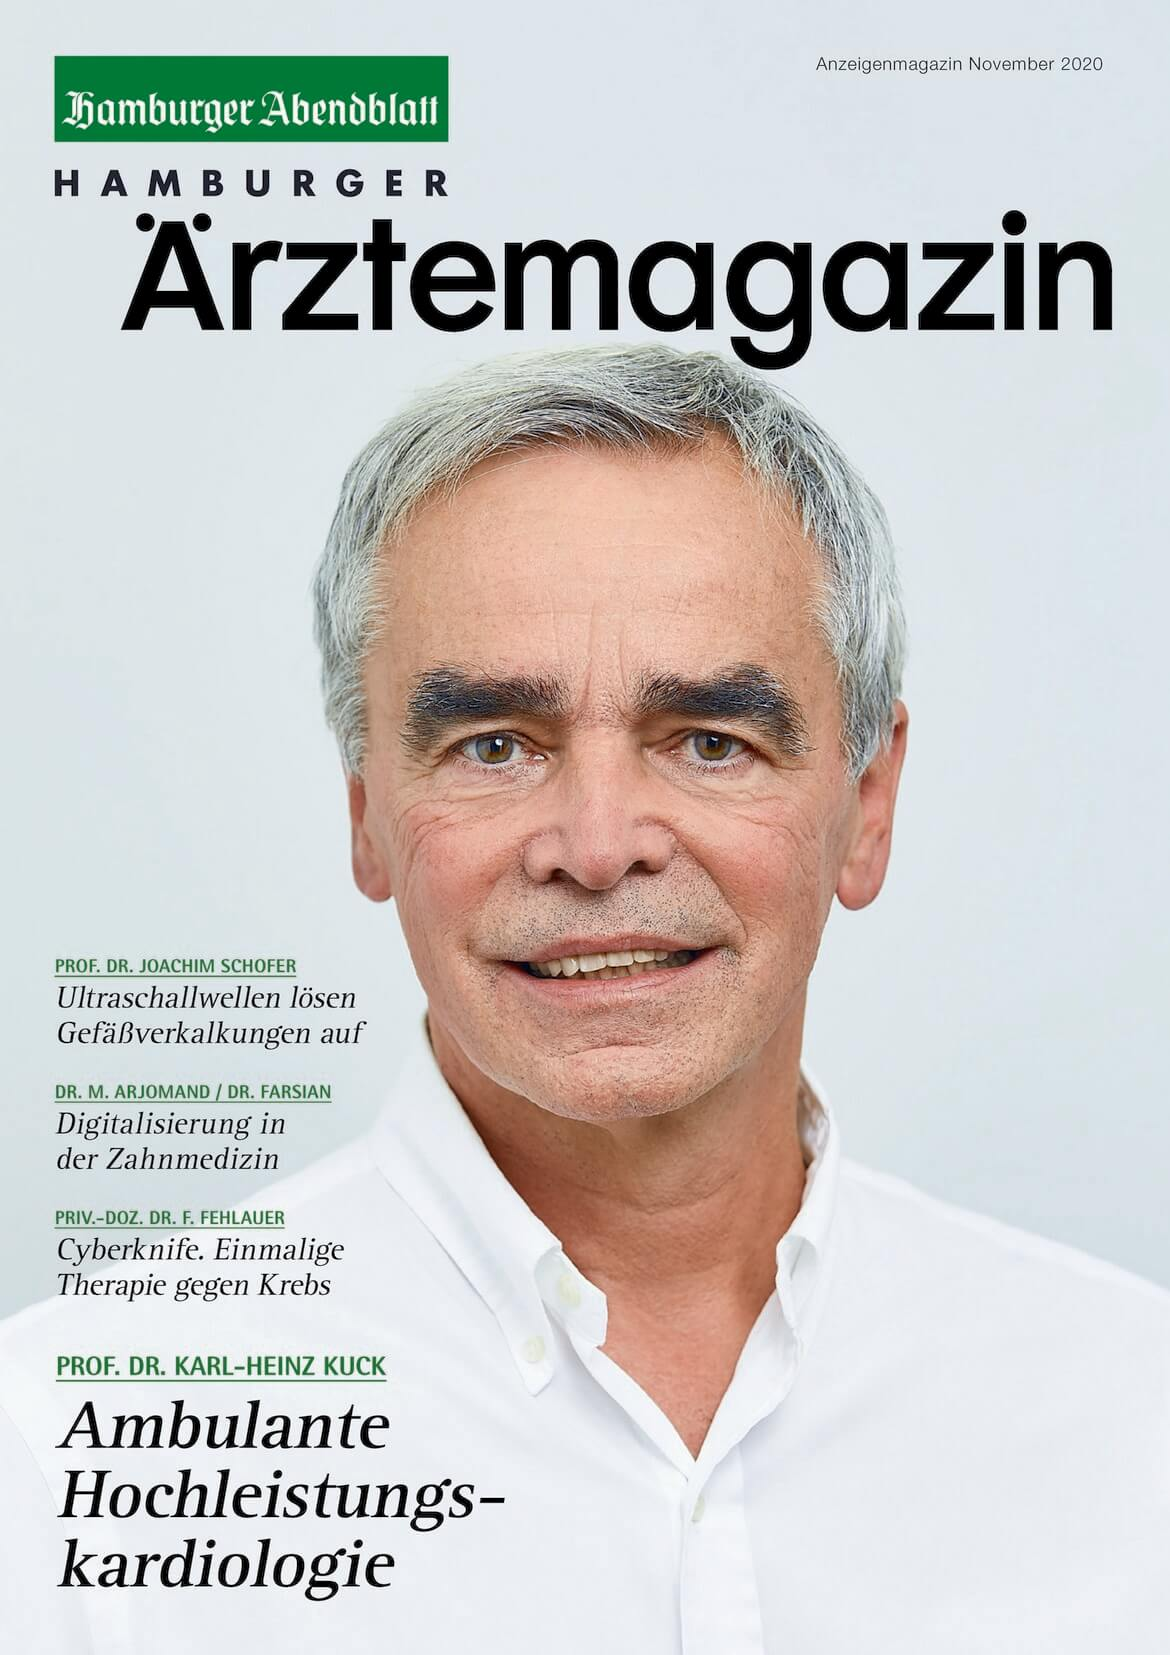 Hamburger Ärztemagazin Ausgabe November 2020 erschienen